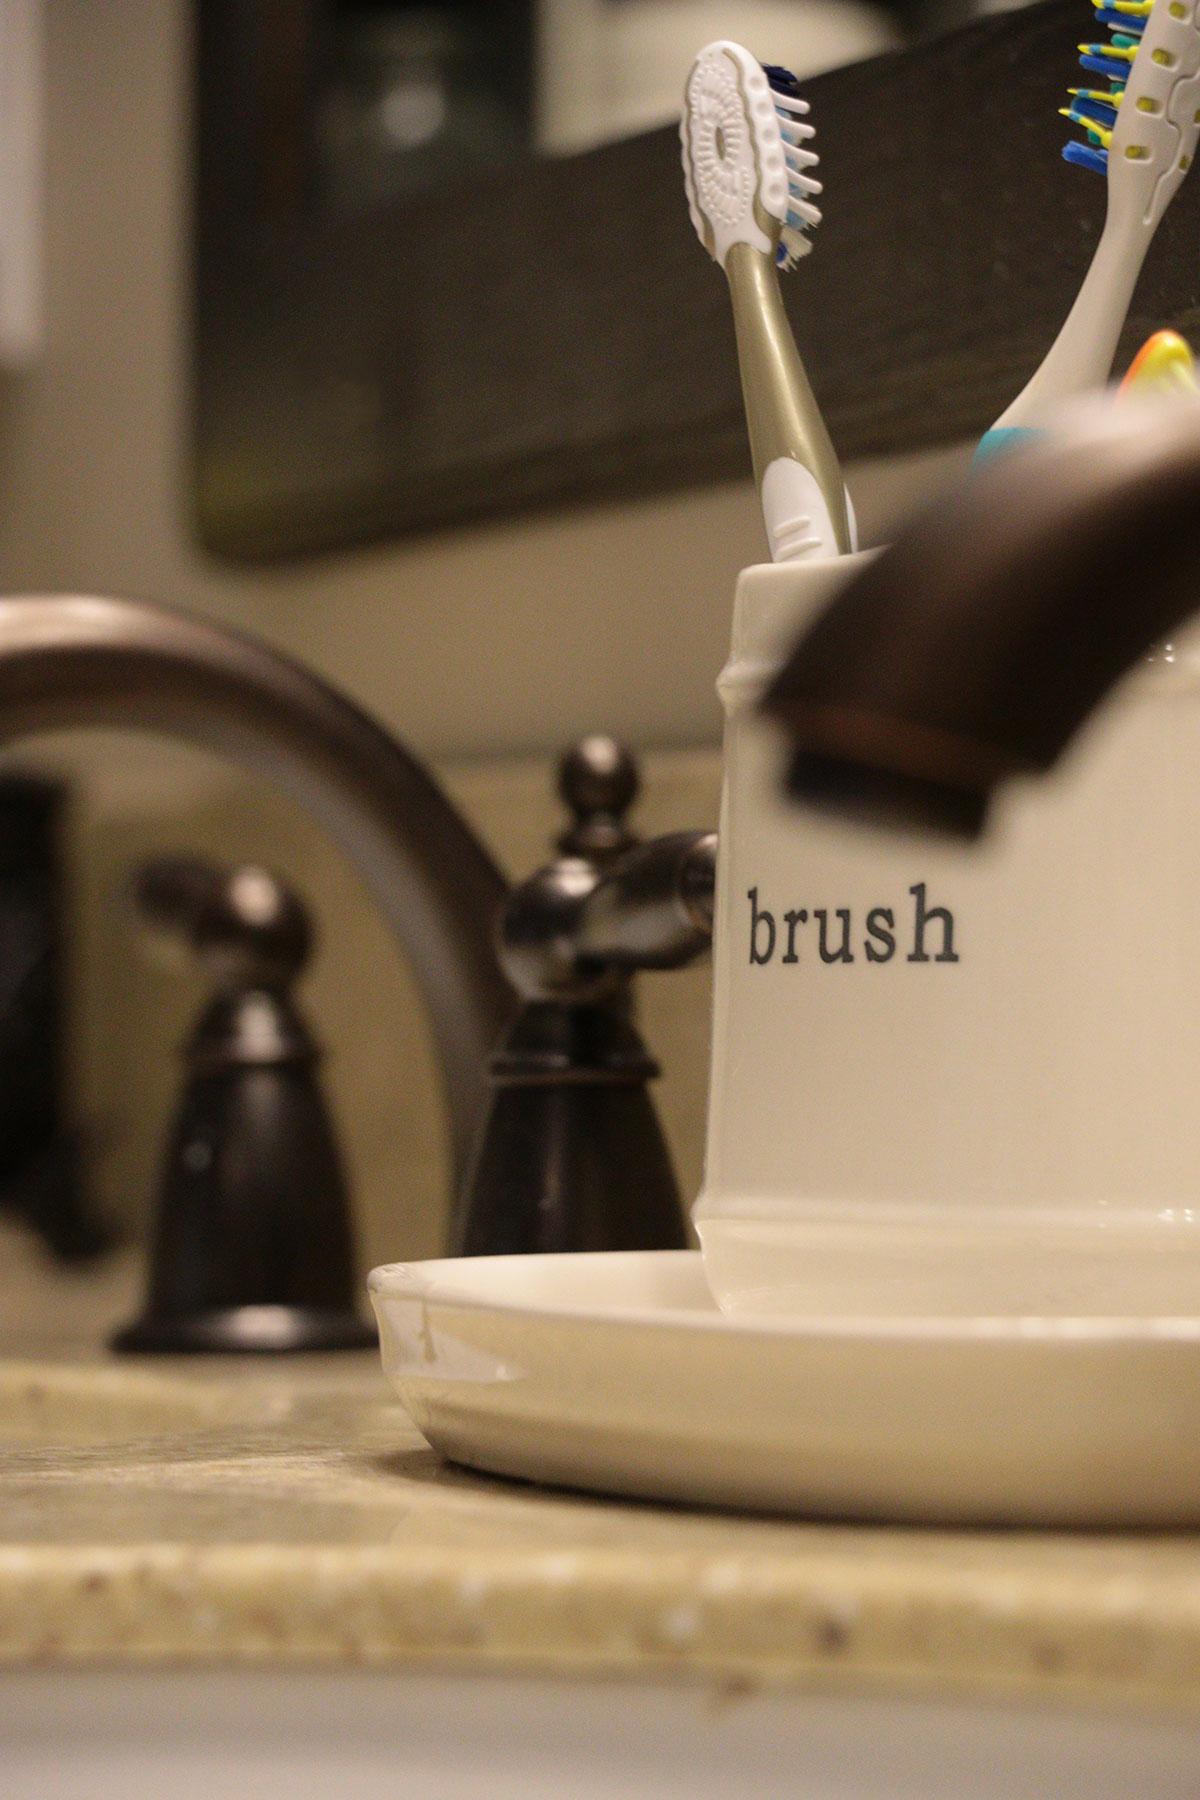 Brush_5830.jpg